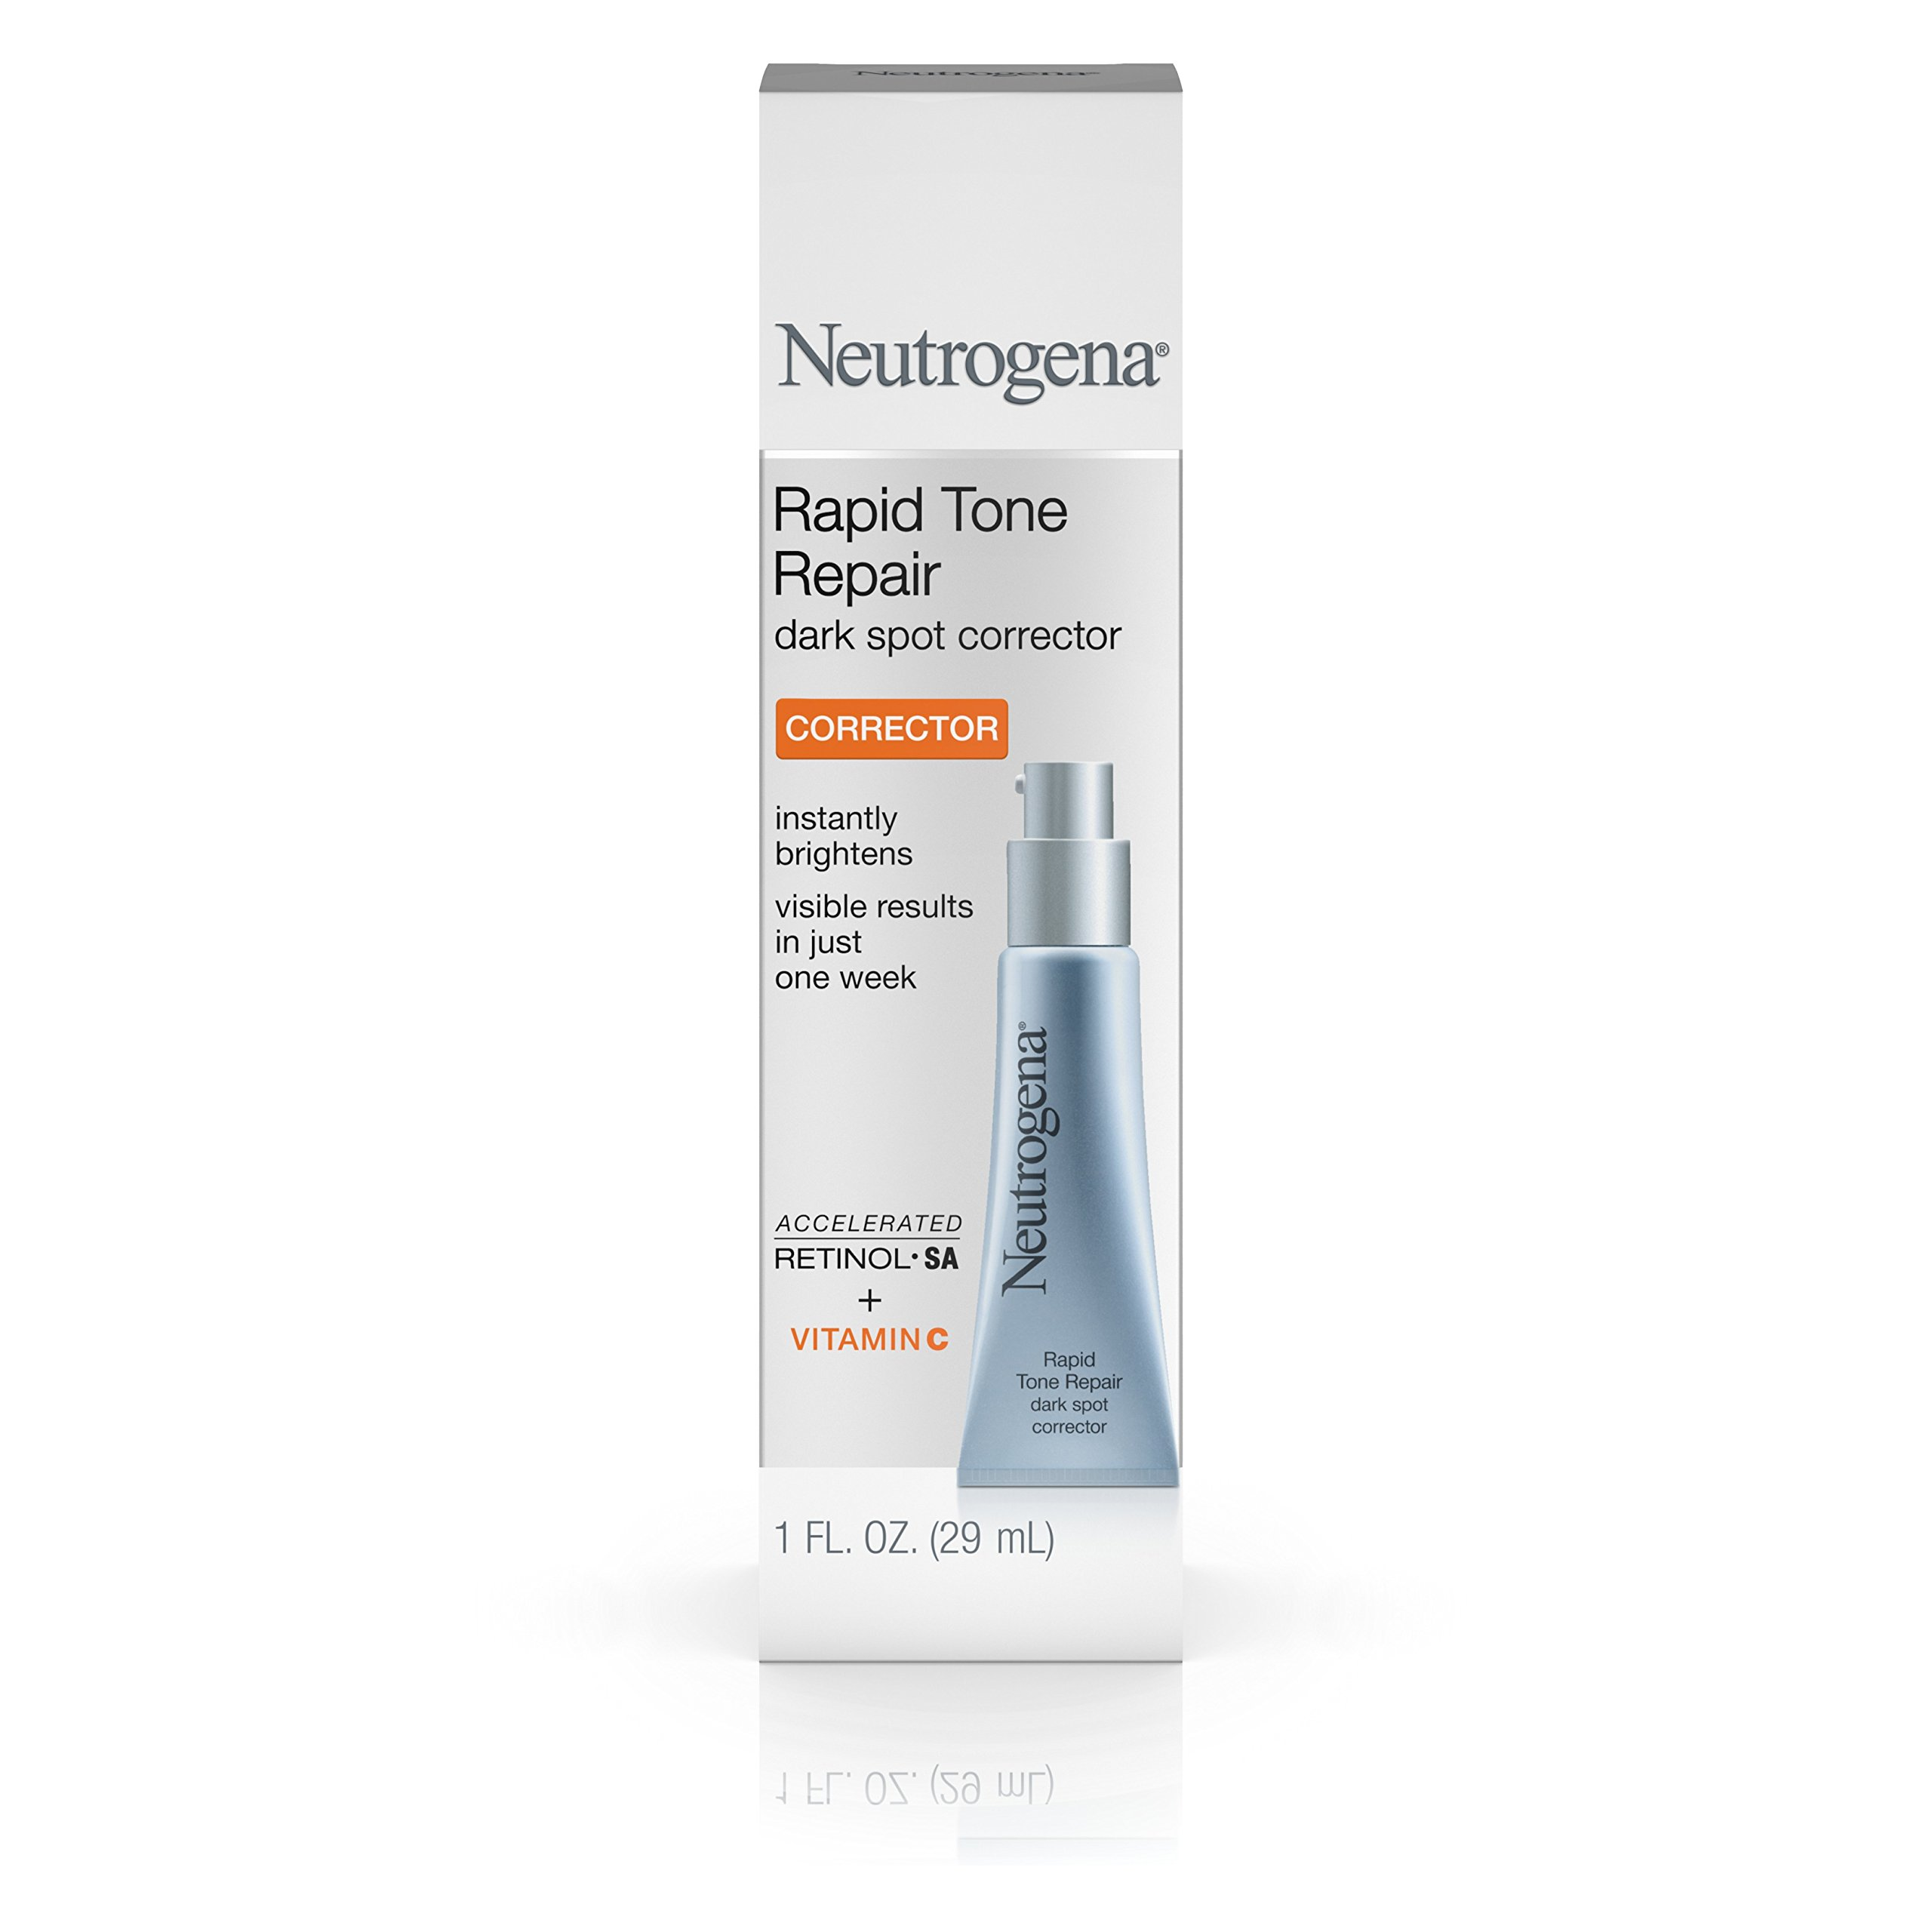 Neutrogena Rapid Tone Repair Dark Spot Corrector with Retinol SA, Vitamin C, and Hyaluronic Acid to Diminish the look of Skin Discoloration and dark Spots, 1 oz